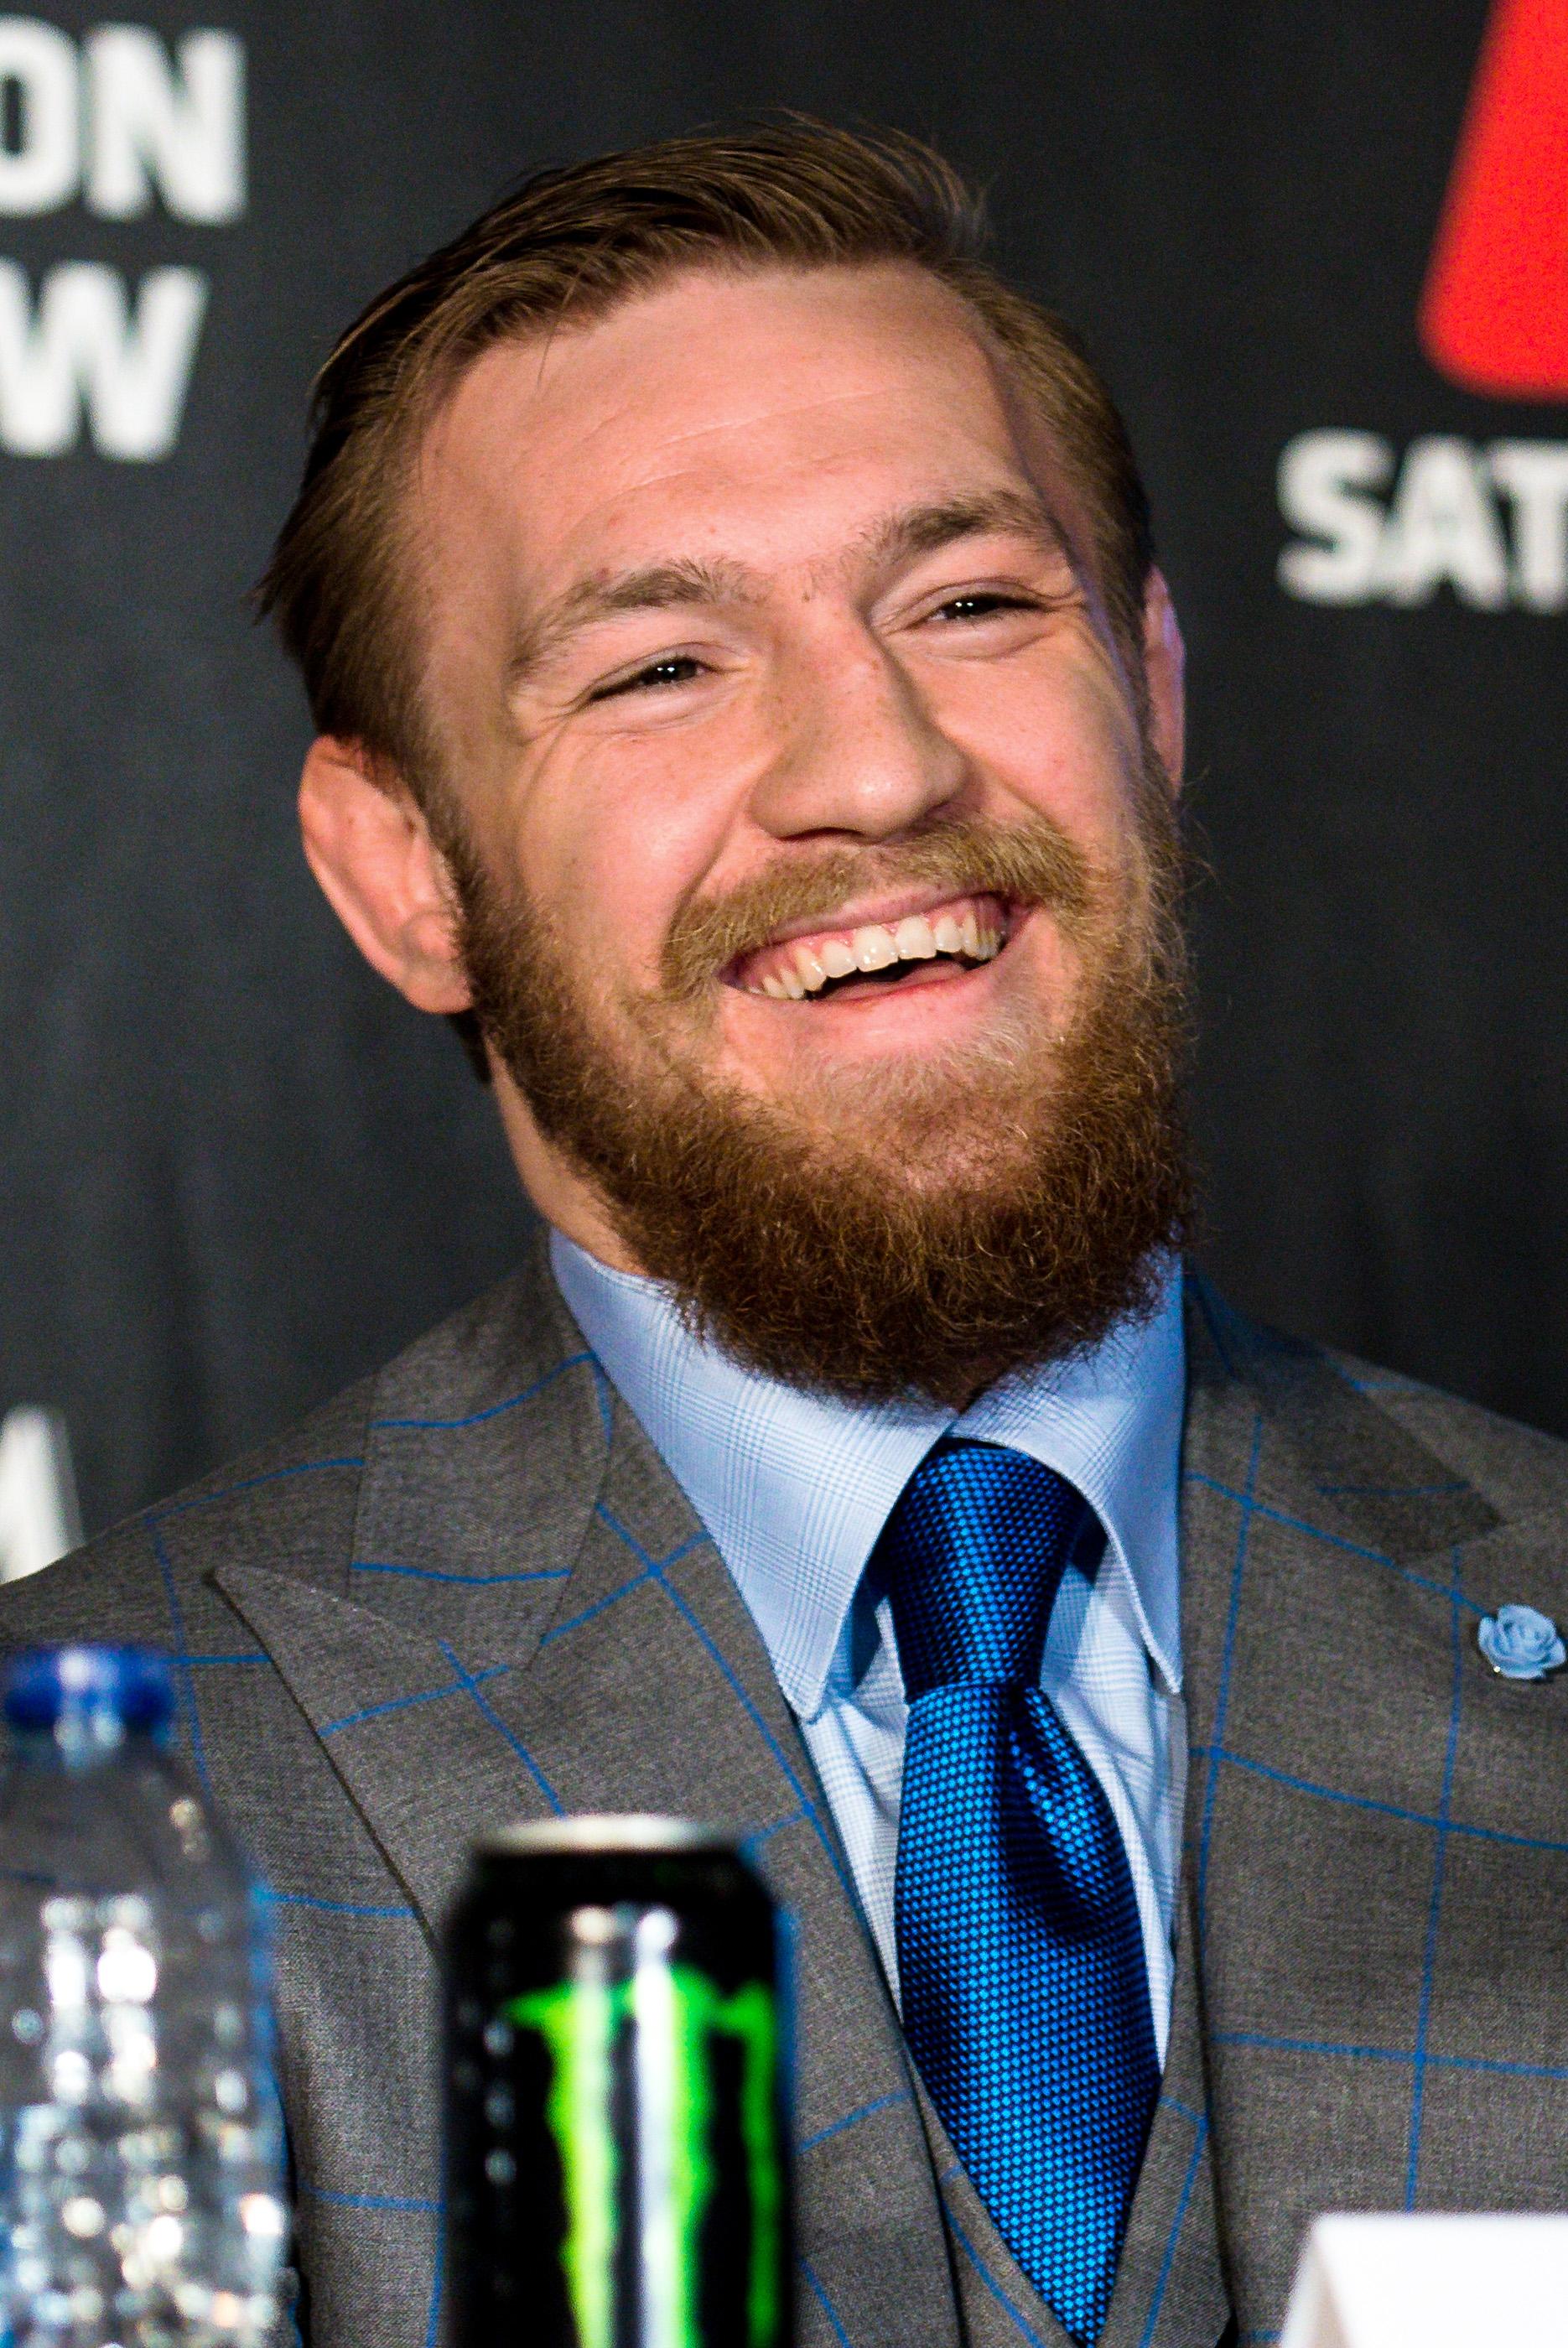 Conor_McGregor,_UFC_189_World_Tour_London_(2)